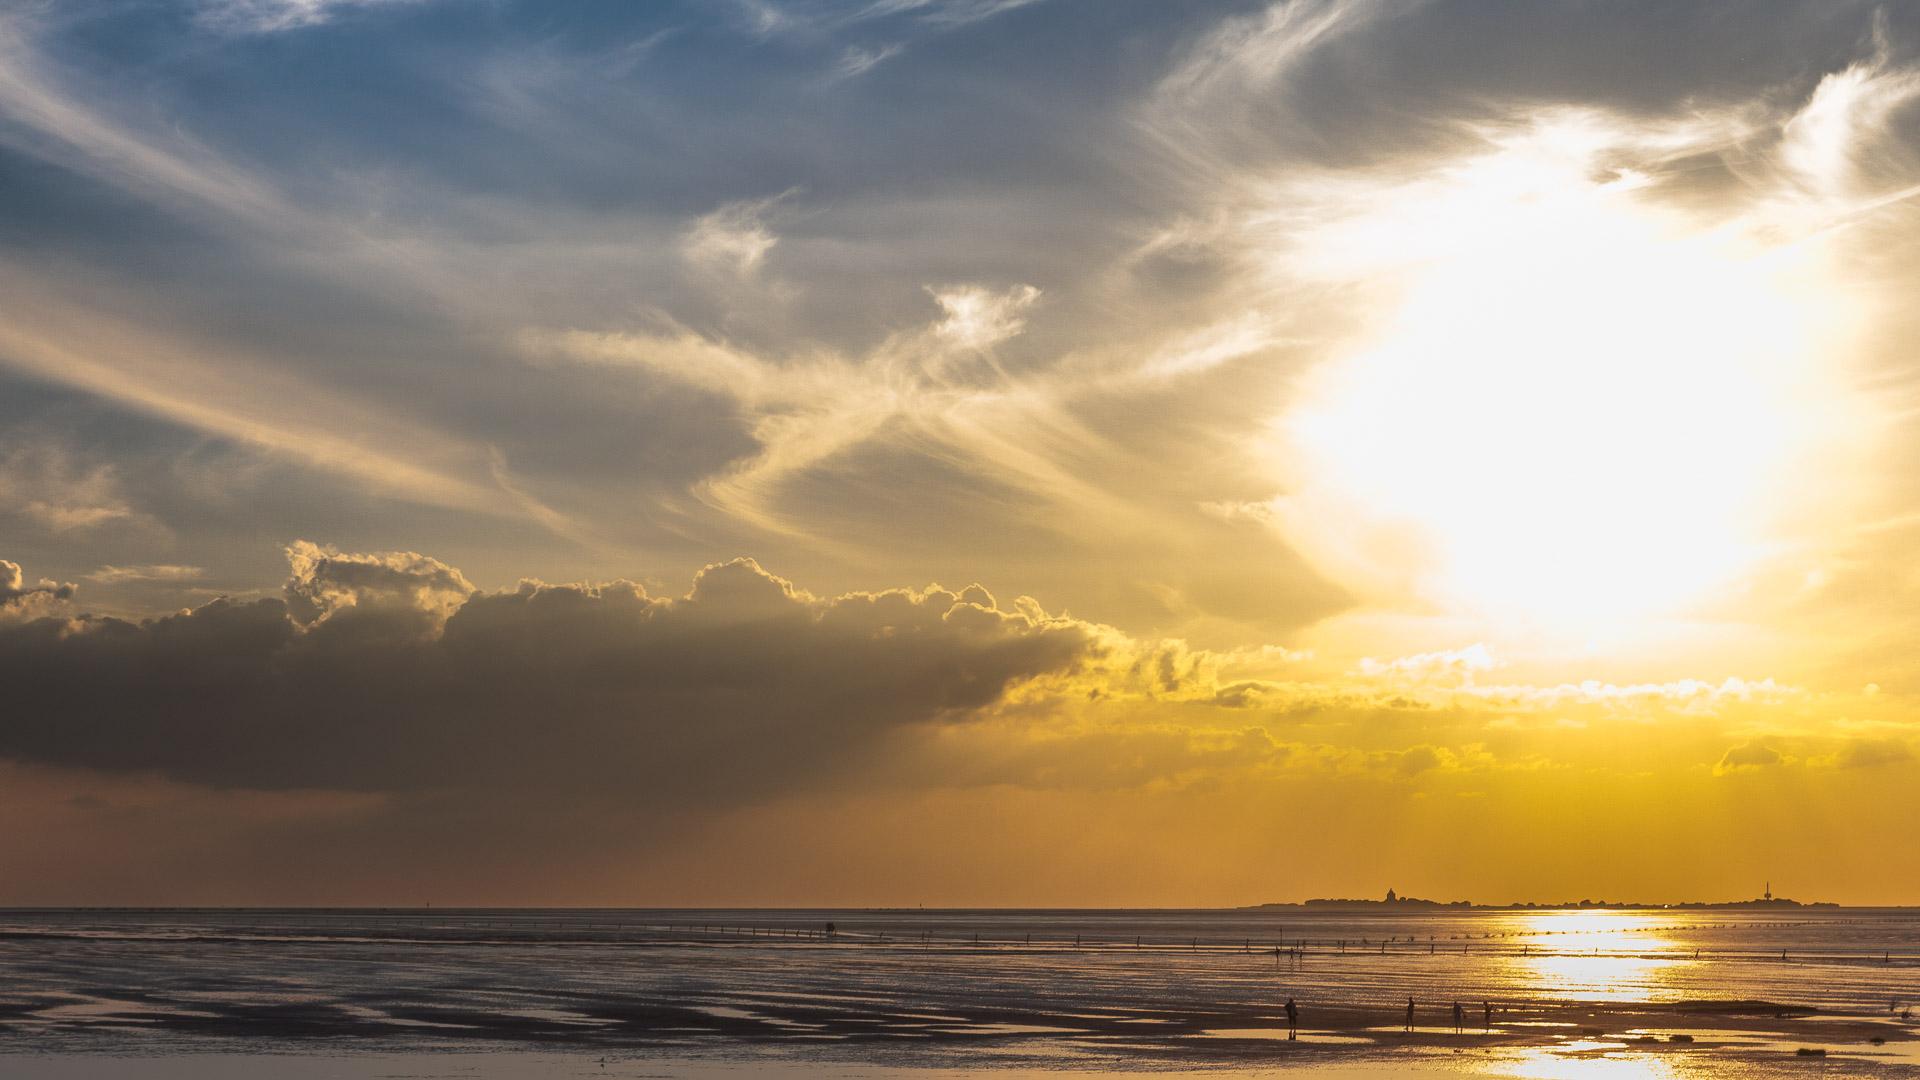 Cuxhaven Sunset I